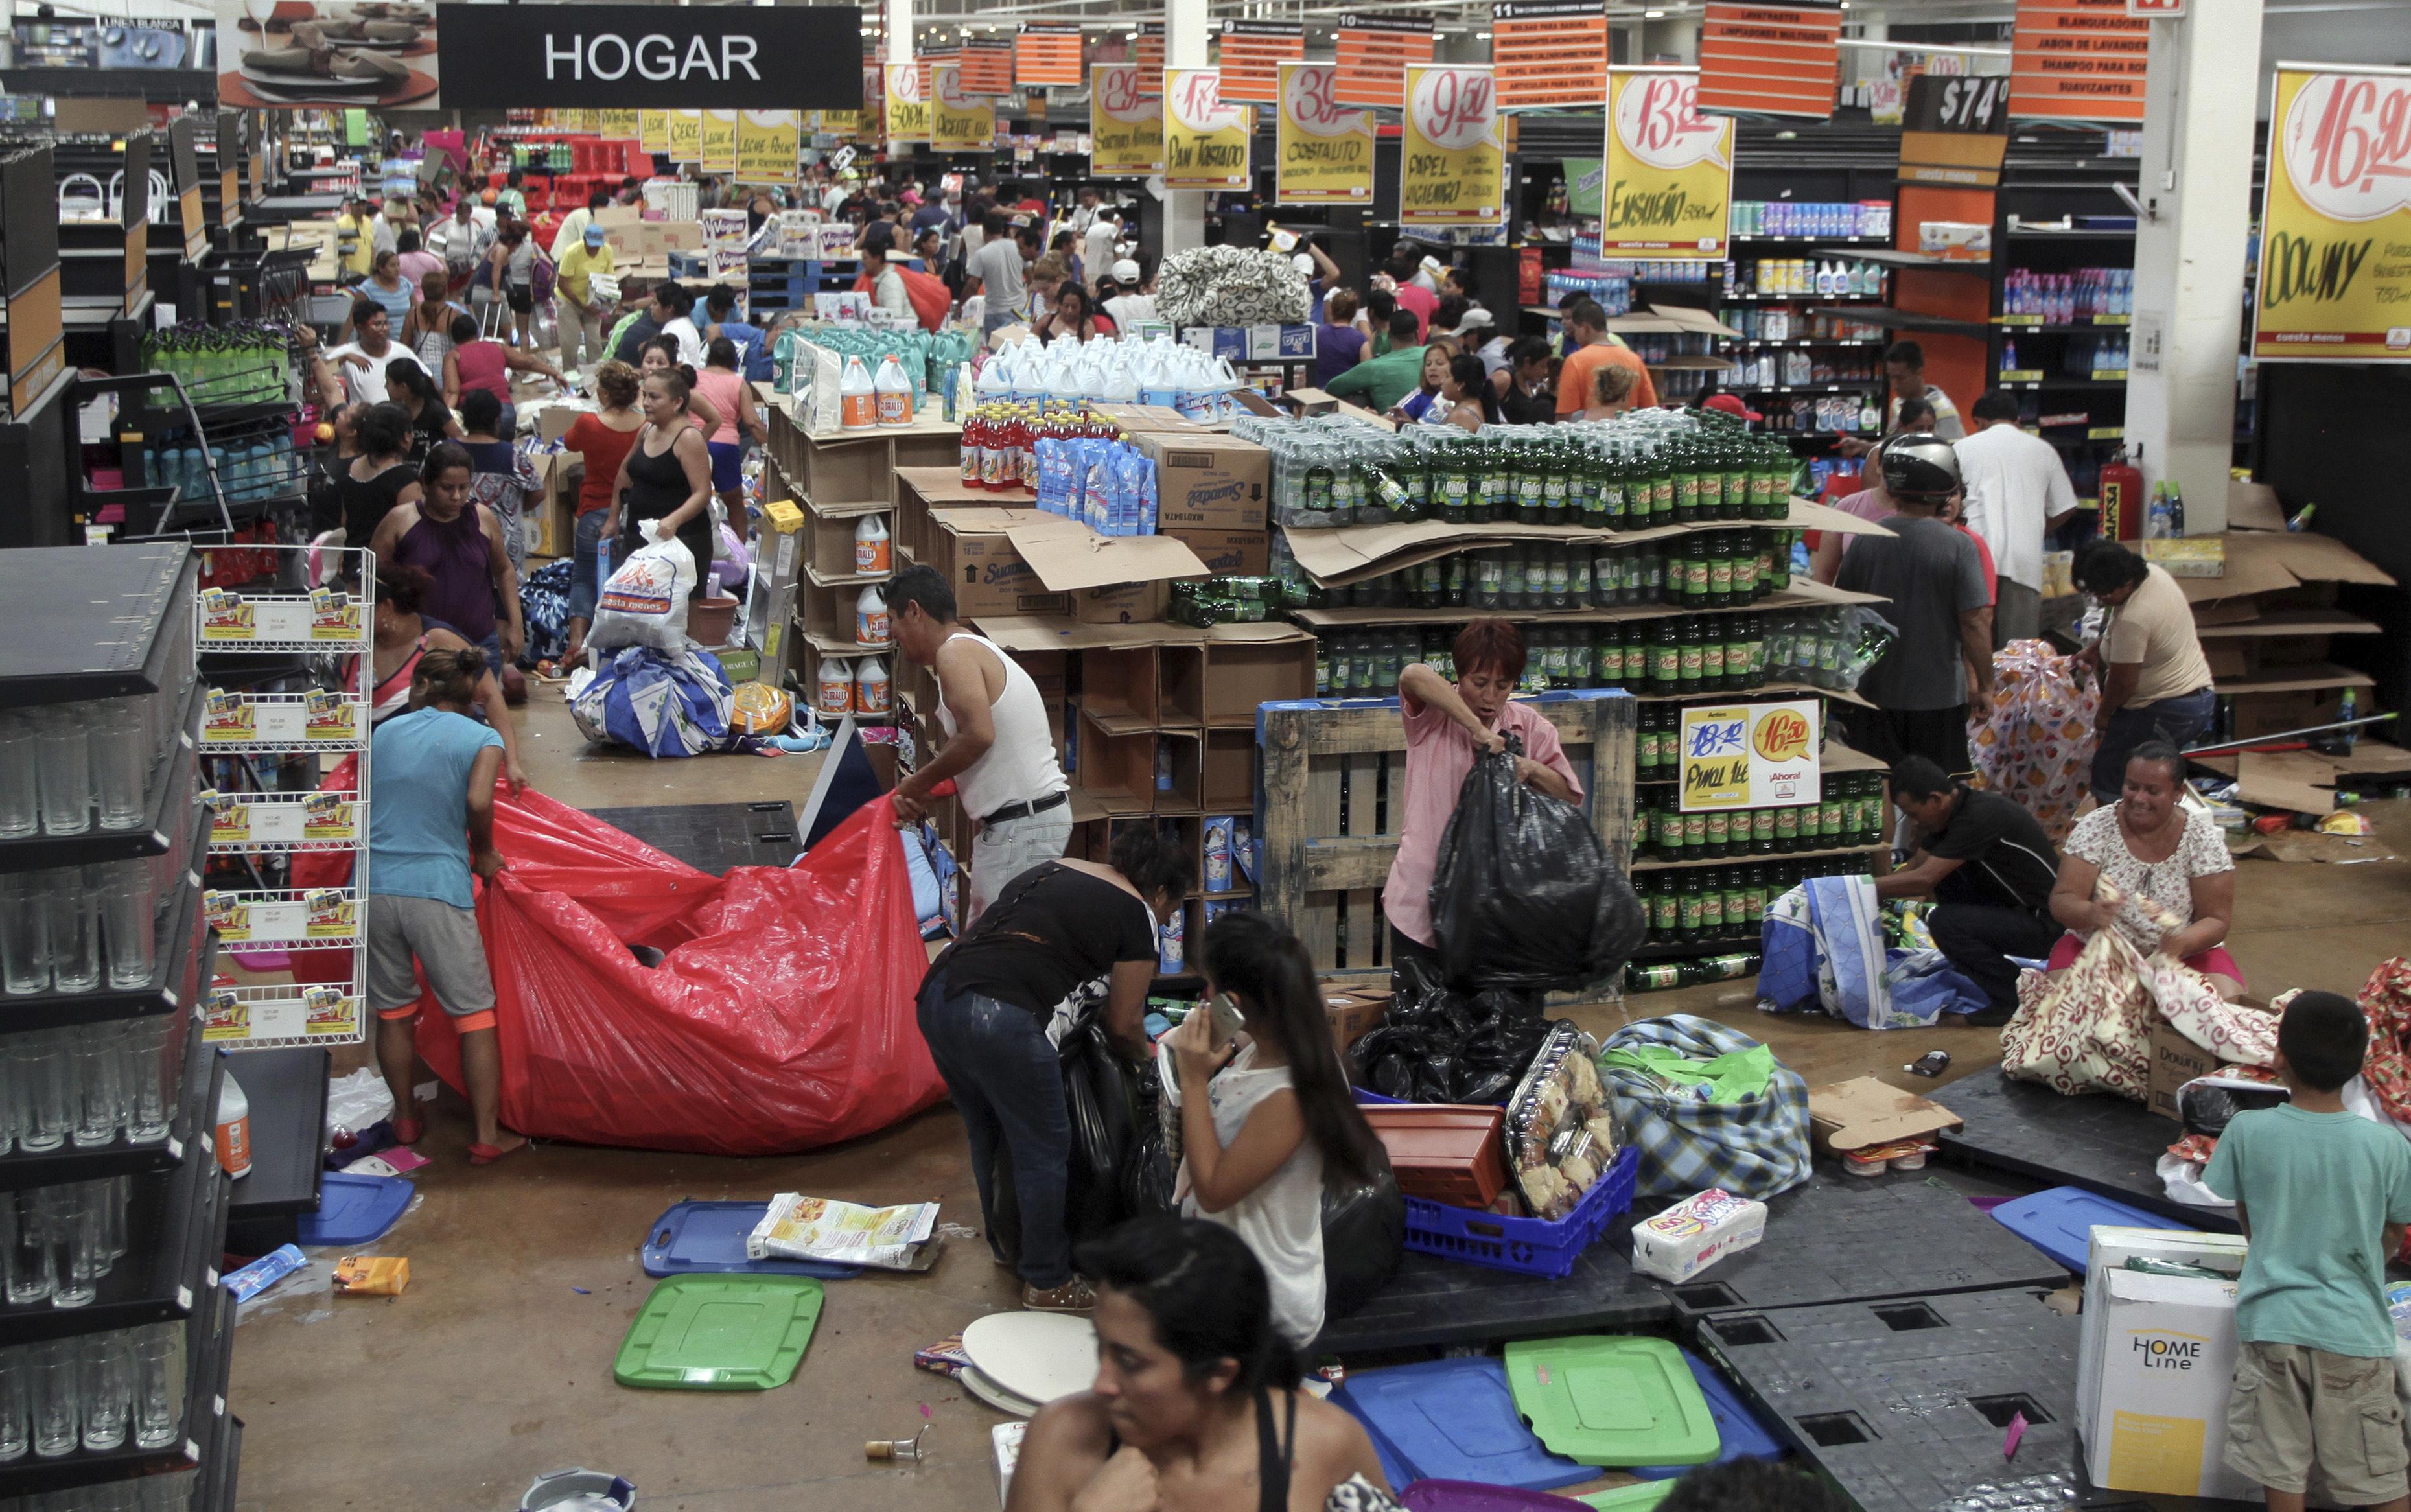 People ransack a store in Veracruz, Mexico onJan. 5, 2017. (AP Photo/Felix Marquez)